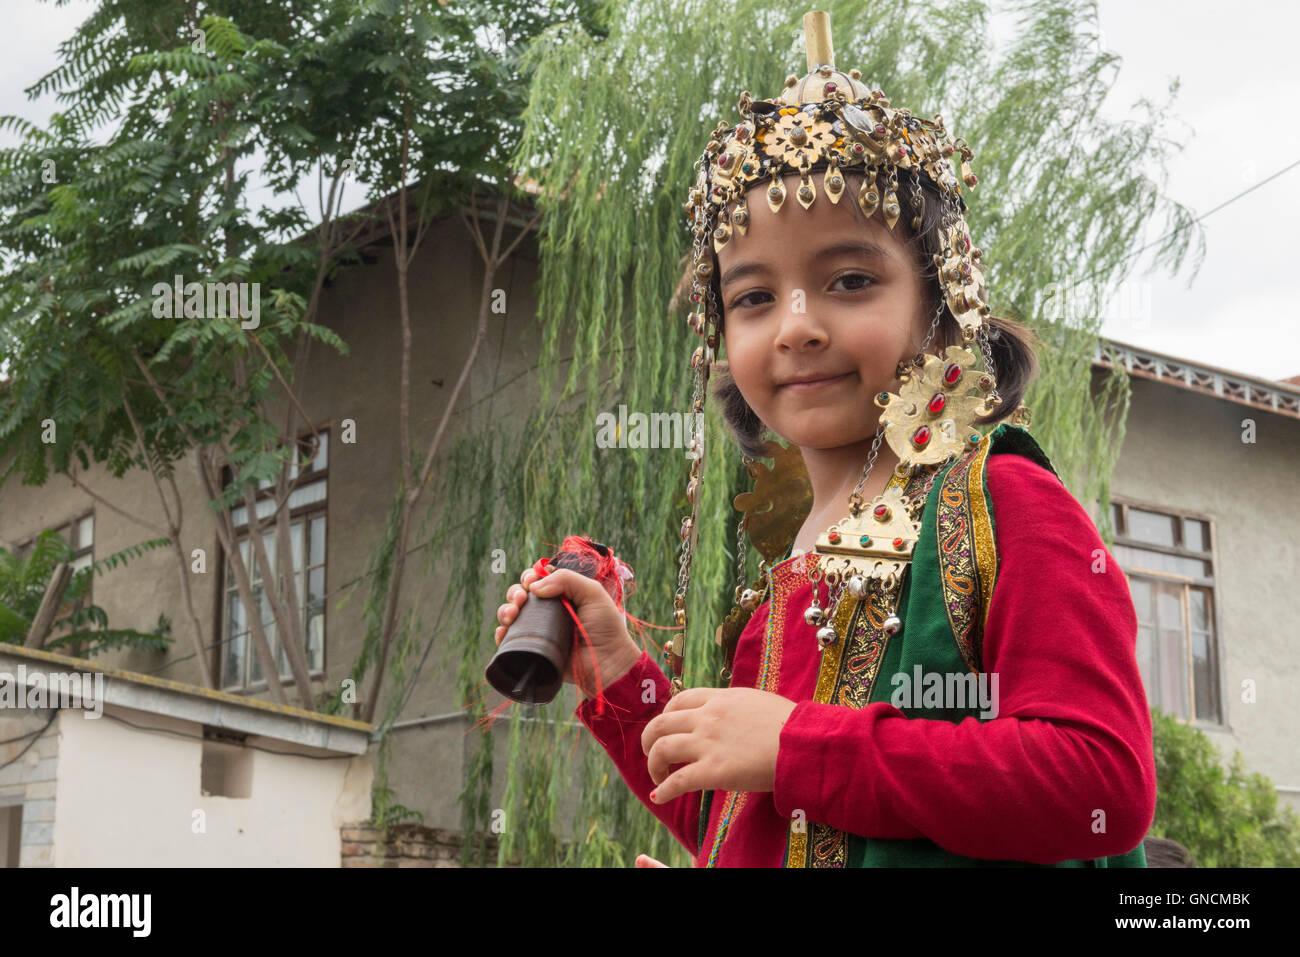 Bandar Torkaman, Turkmen Wedding, Girl Wearing Traditional Dress Outside Lunch Venue - Stock Image